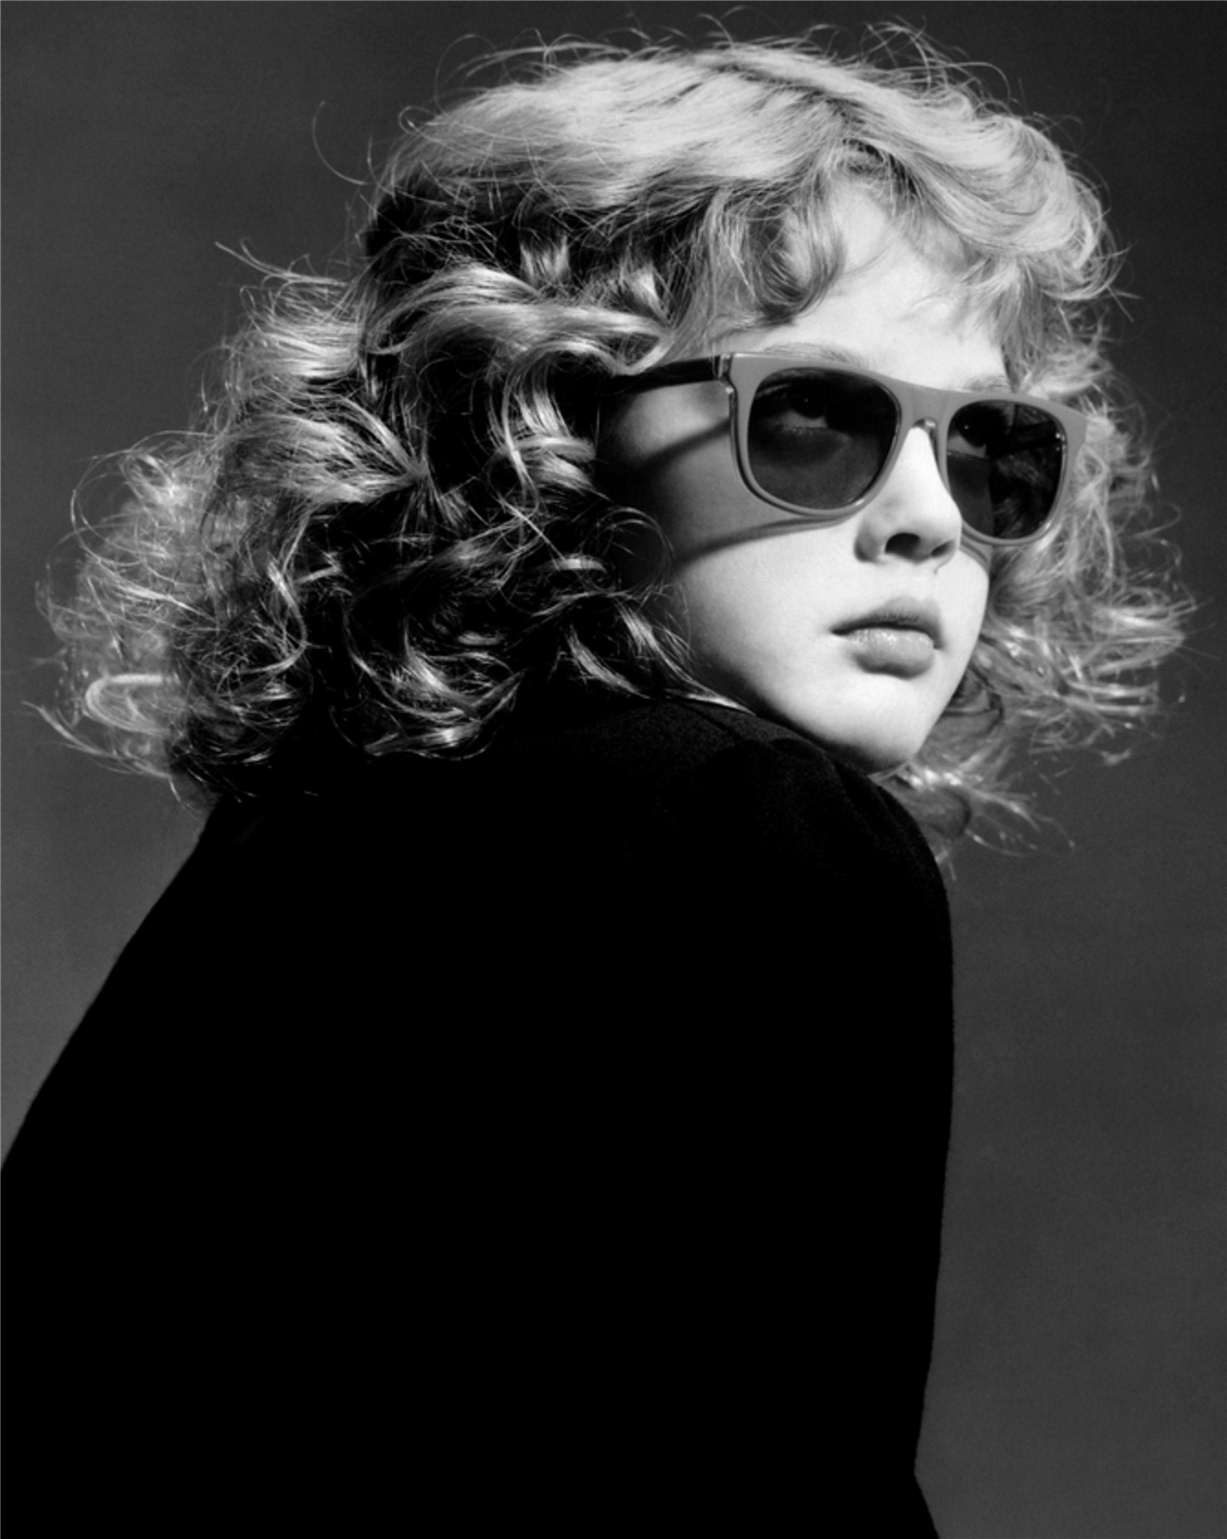 Drew Barrymore / Дрю Бэрримор - портрет фотографа Грега Гормана / Greg Gorman